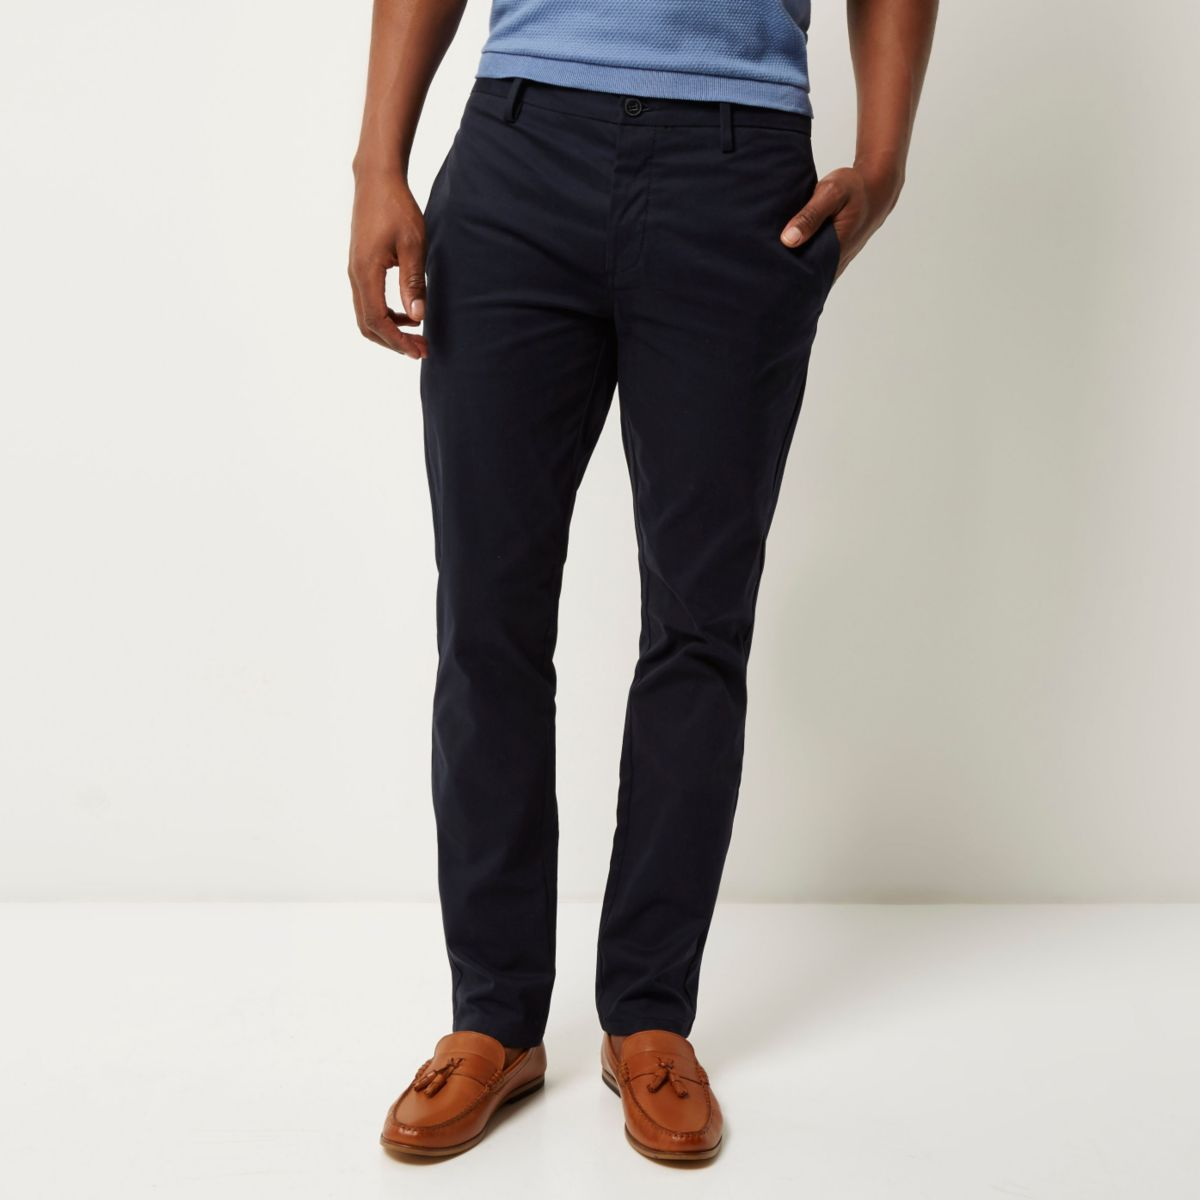 pantalon chino bleu marine stretch slim bureau soldes. Black Bedroom Furniture Sets. Home Design Ideas